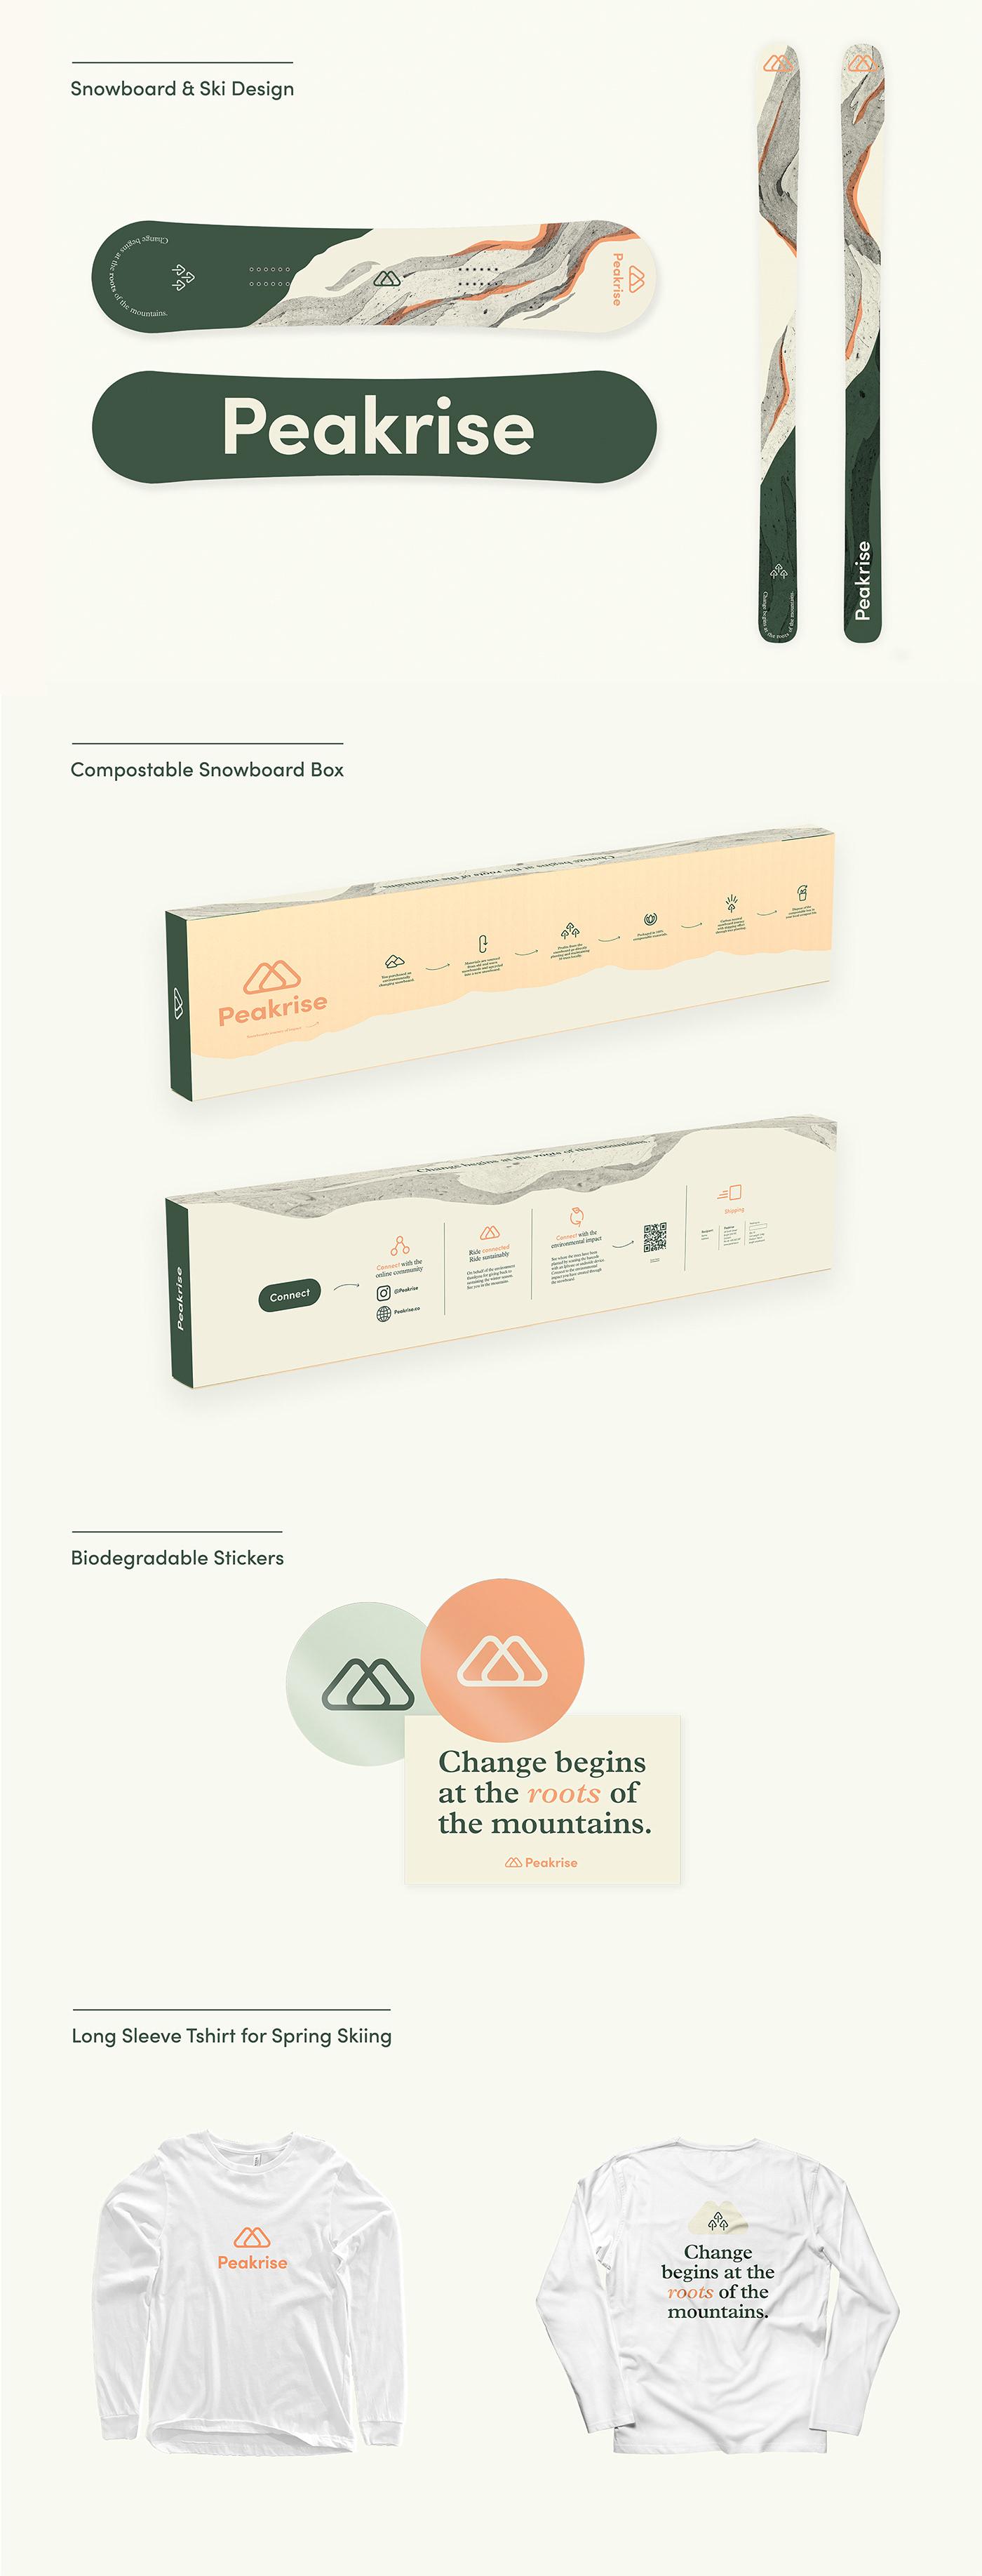 brand identity branding  environment graphic design  mountains skiing snow Snowboarding Sustainability trees